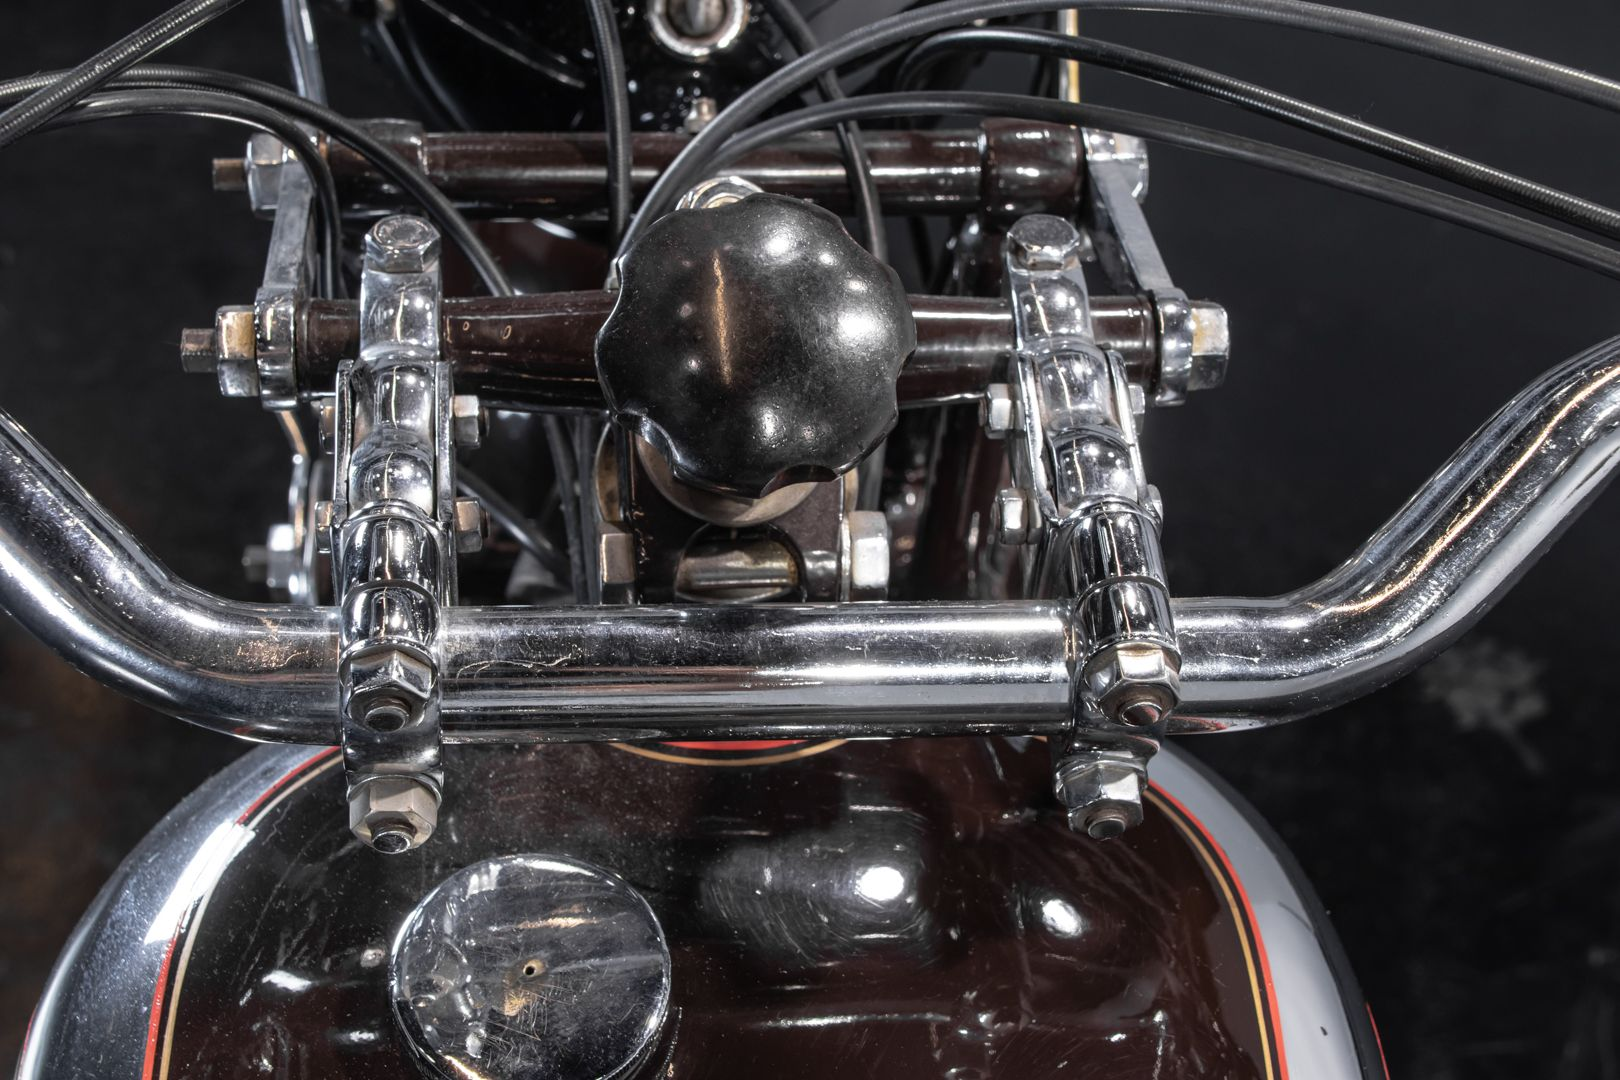 1951 Moto Guzzi 500 72189